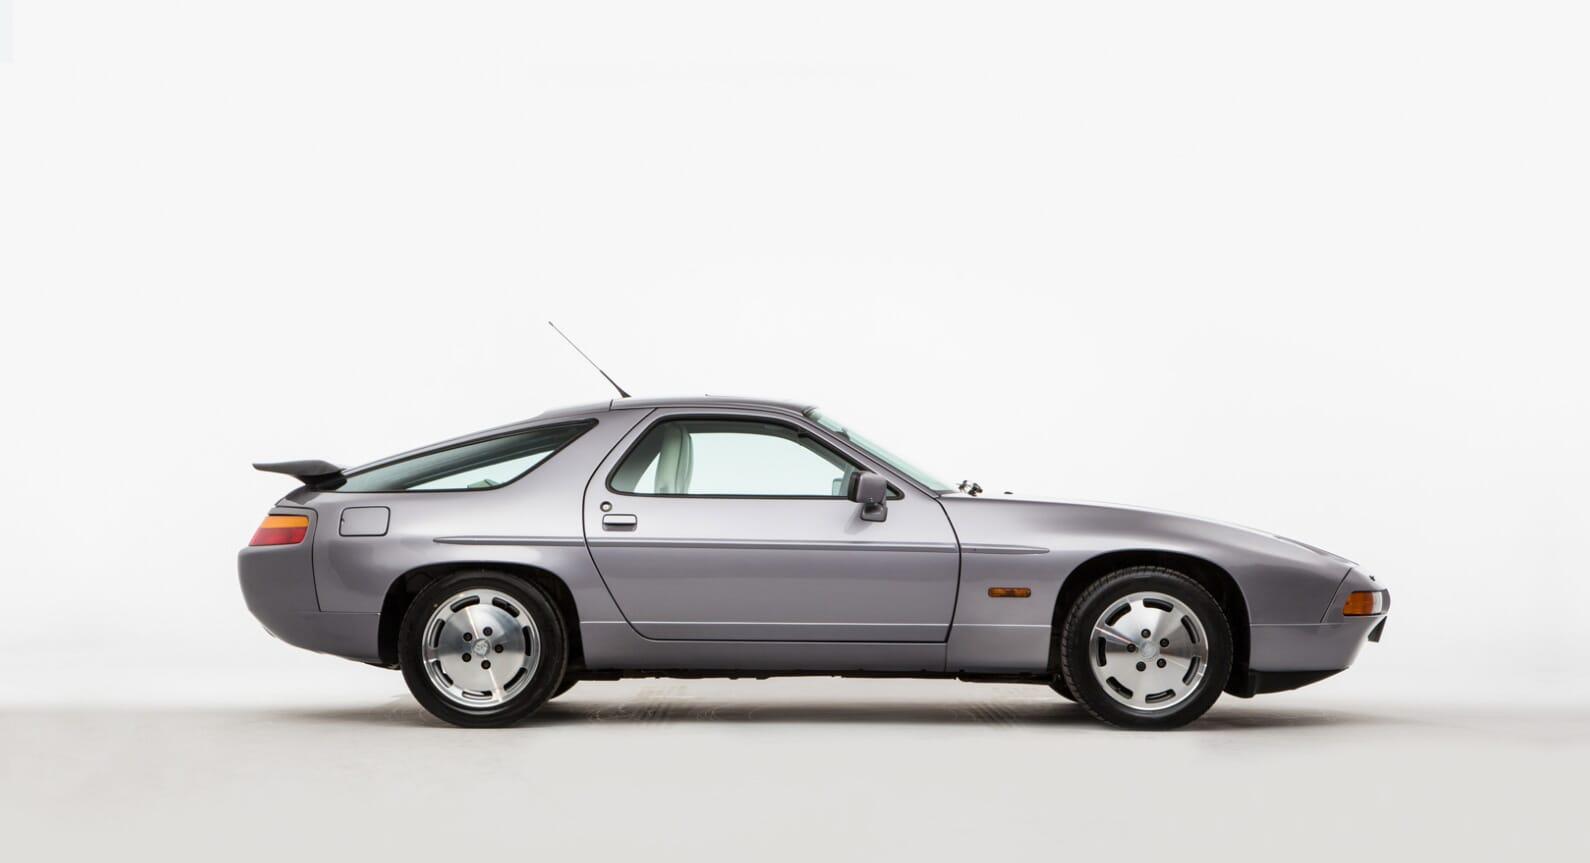 Classic Car Find of the Week: Porsche 928 S4